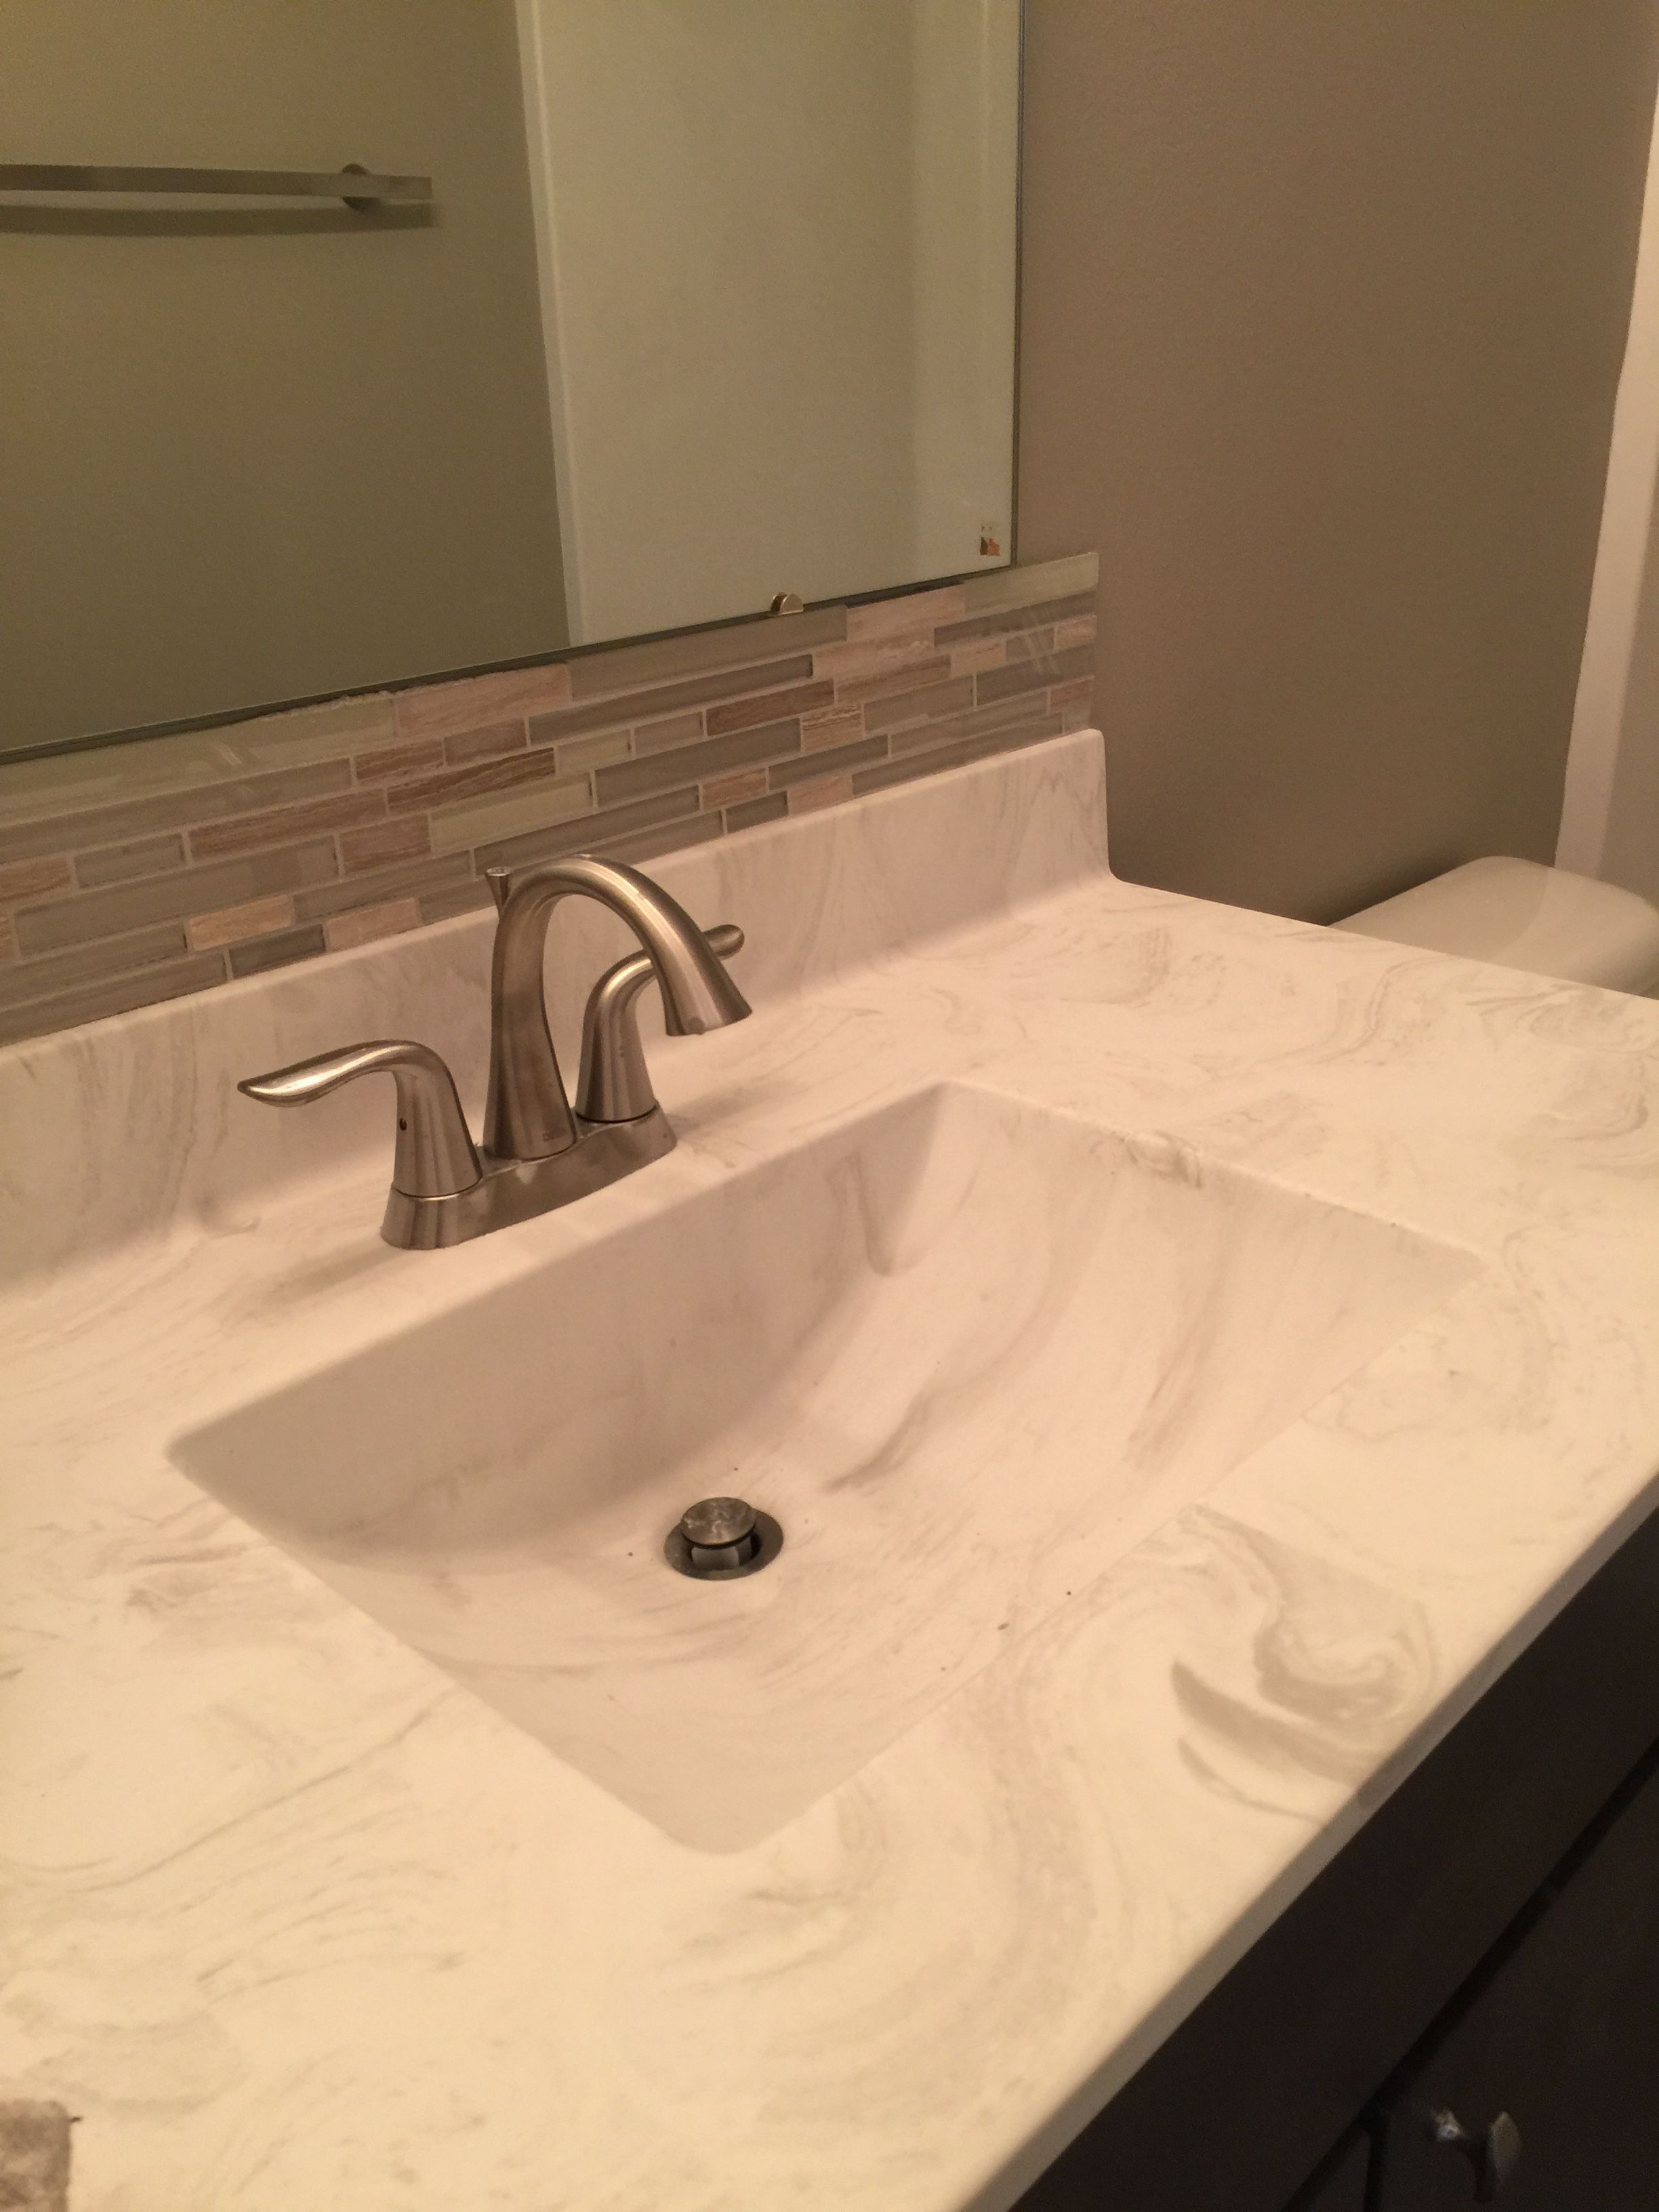 Bathroom Vanity Backsplash Stone And Glass Mosaic